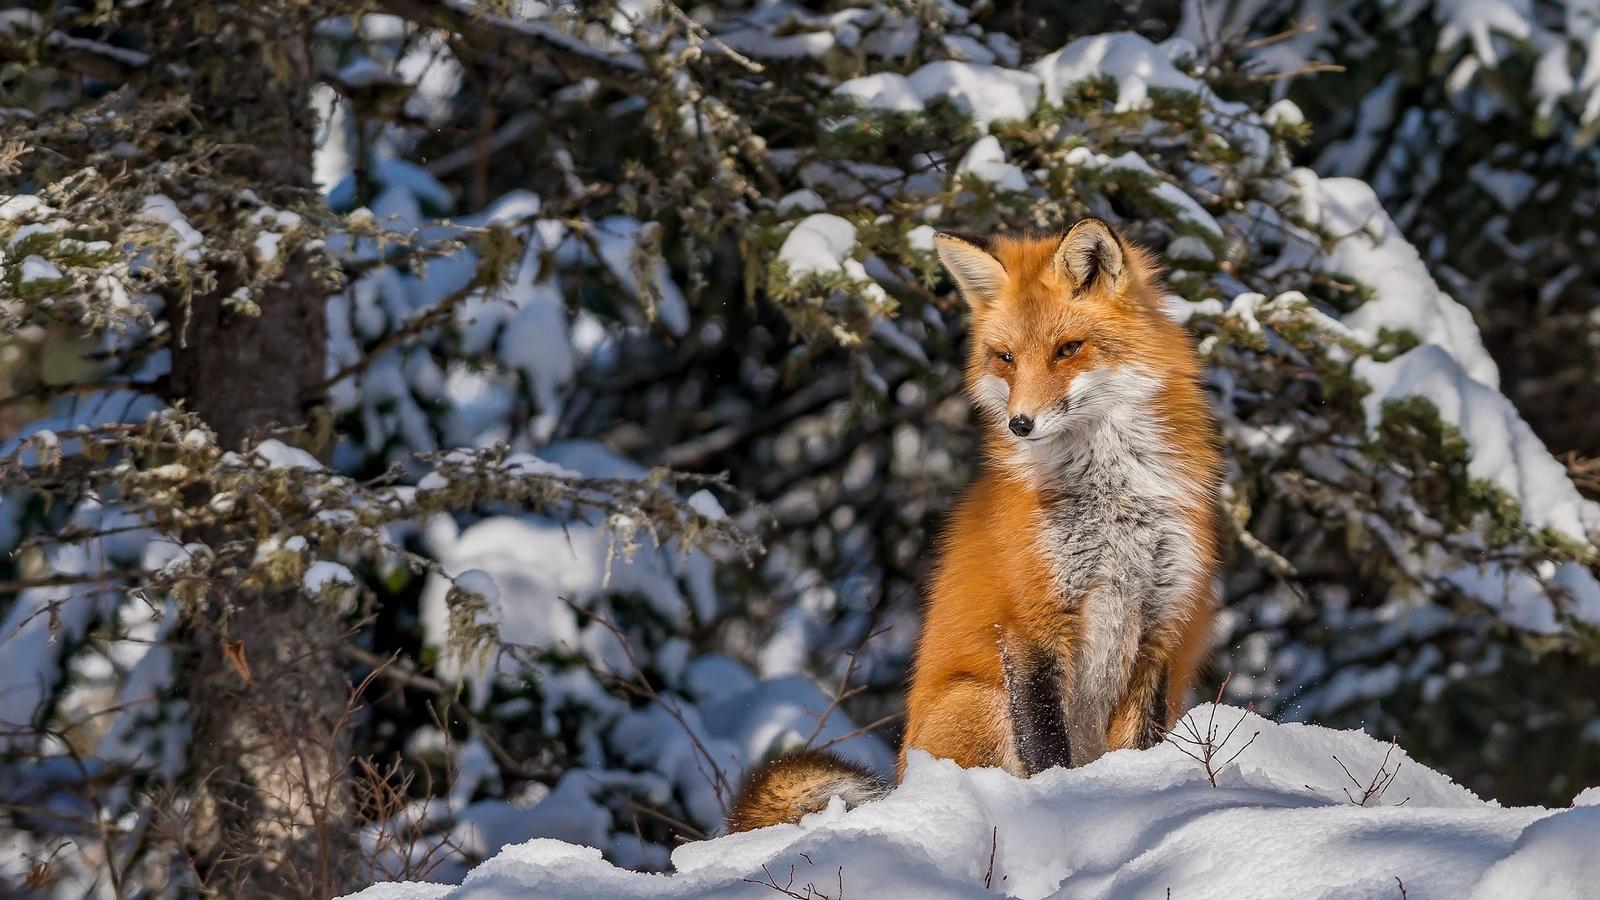 животное, лиса, лисица, природа, зима, снег, лес, деревья